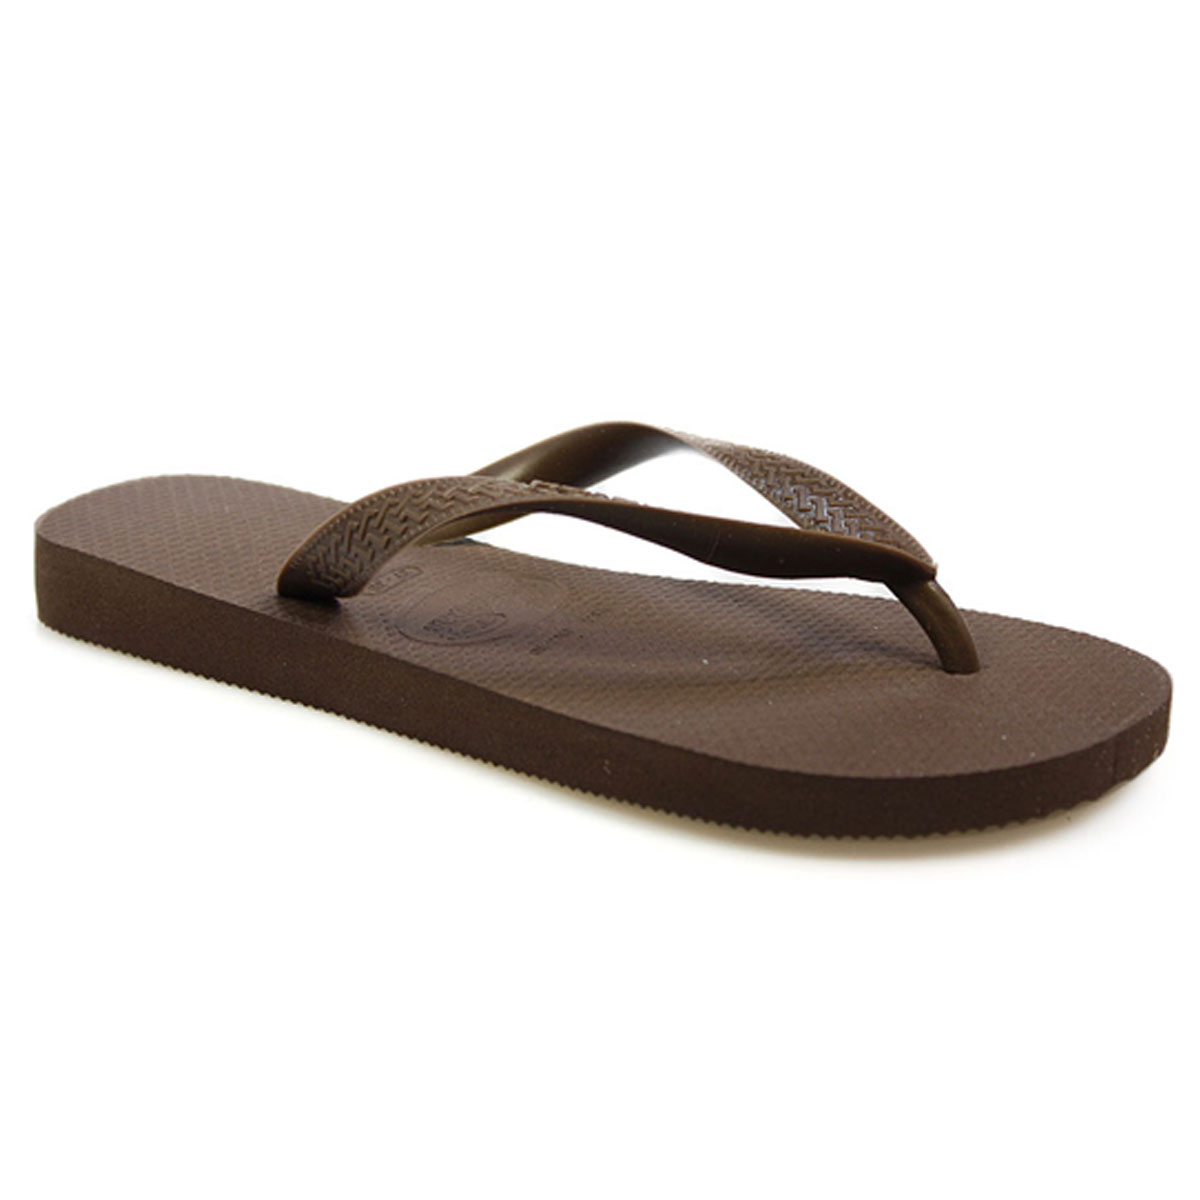 havaianas mens womens brown rubber flip flops sandals shoes size 2 10 ebay. Black Bedroom Furniture Sets. Home Design Ideas